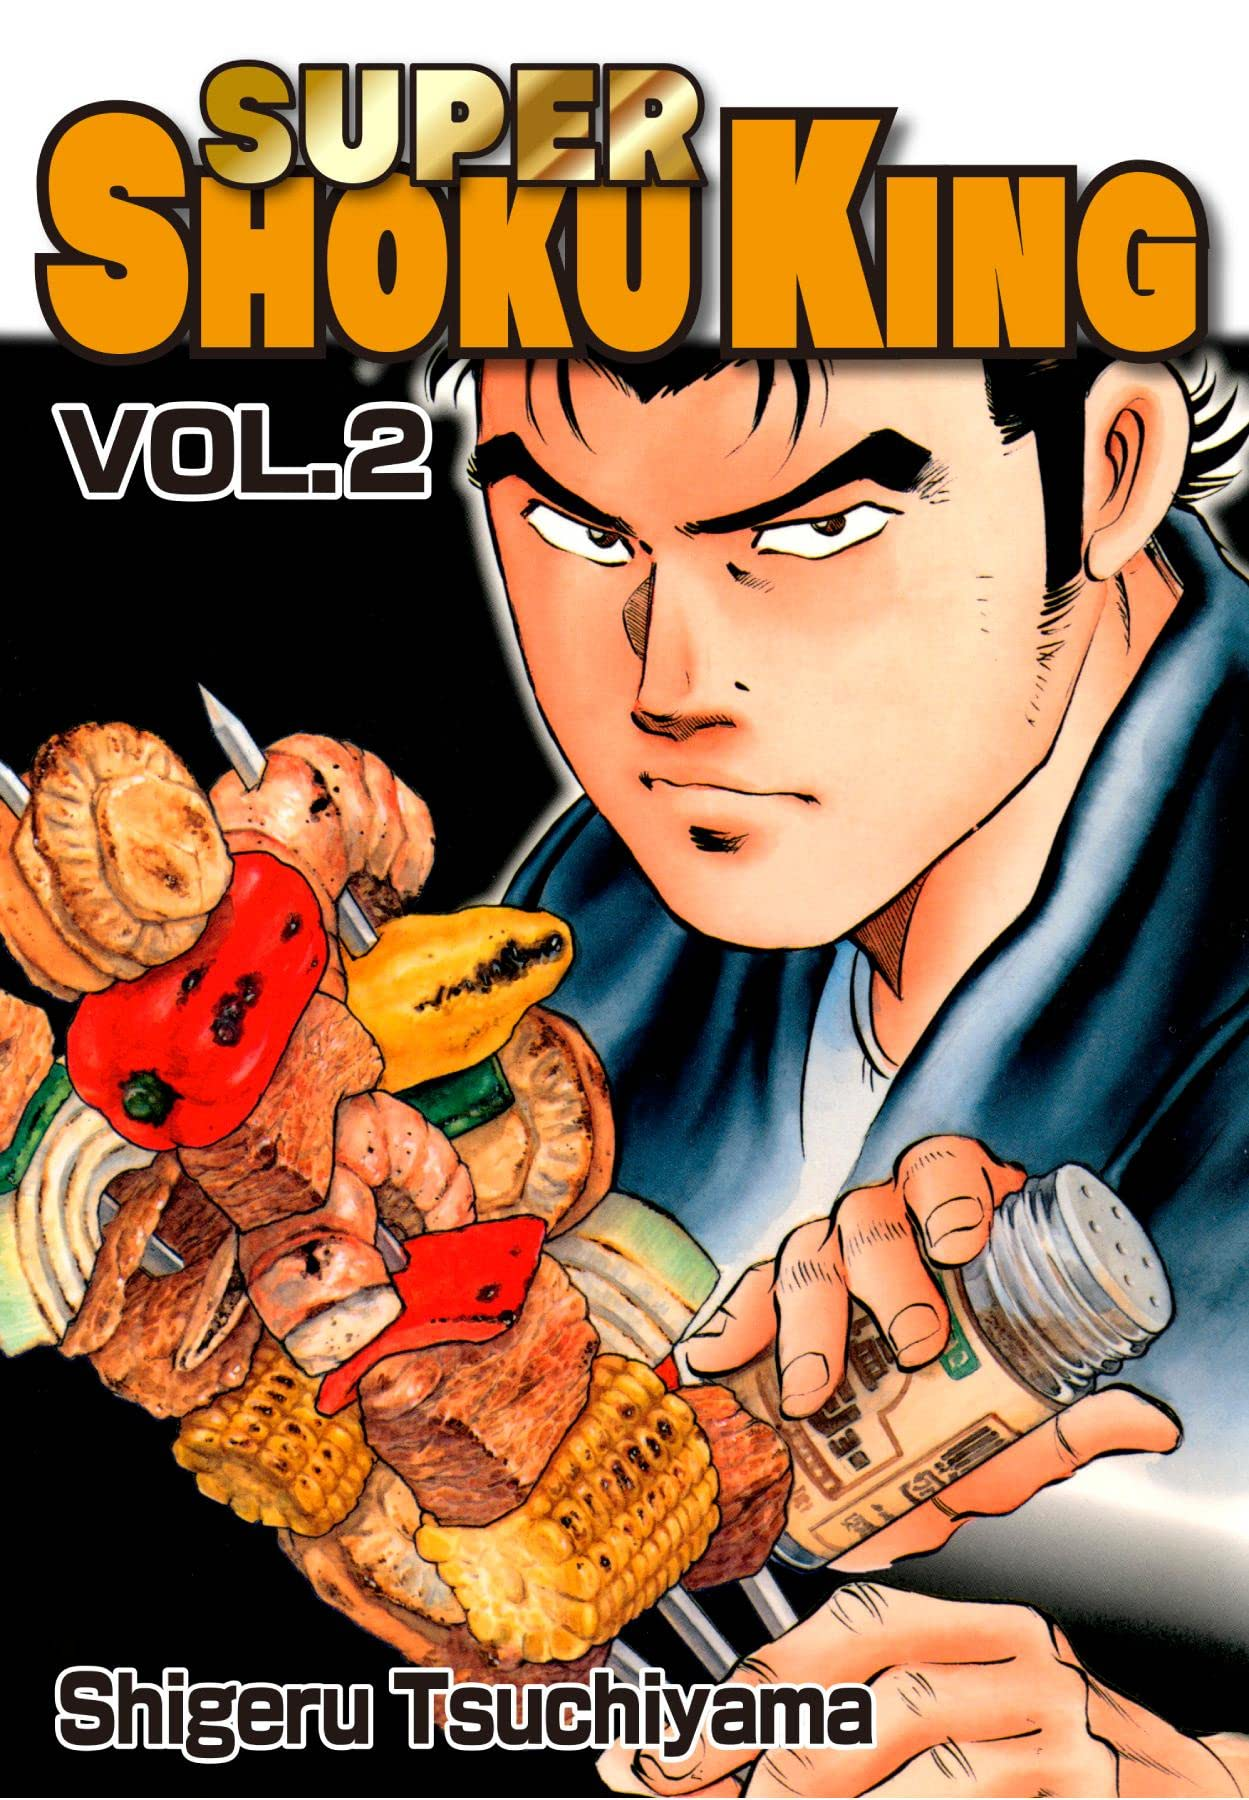 SUPER SHOKU KING Vol. 2